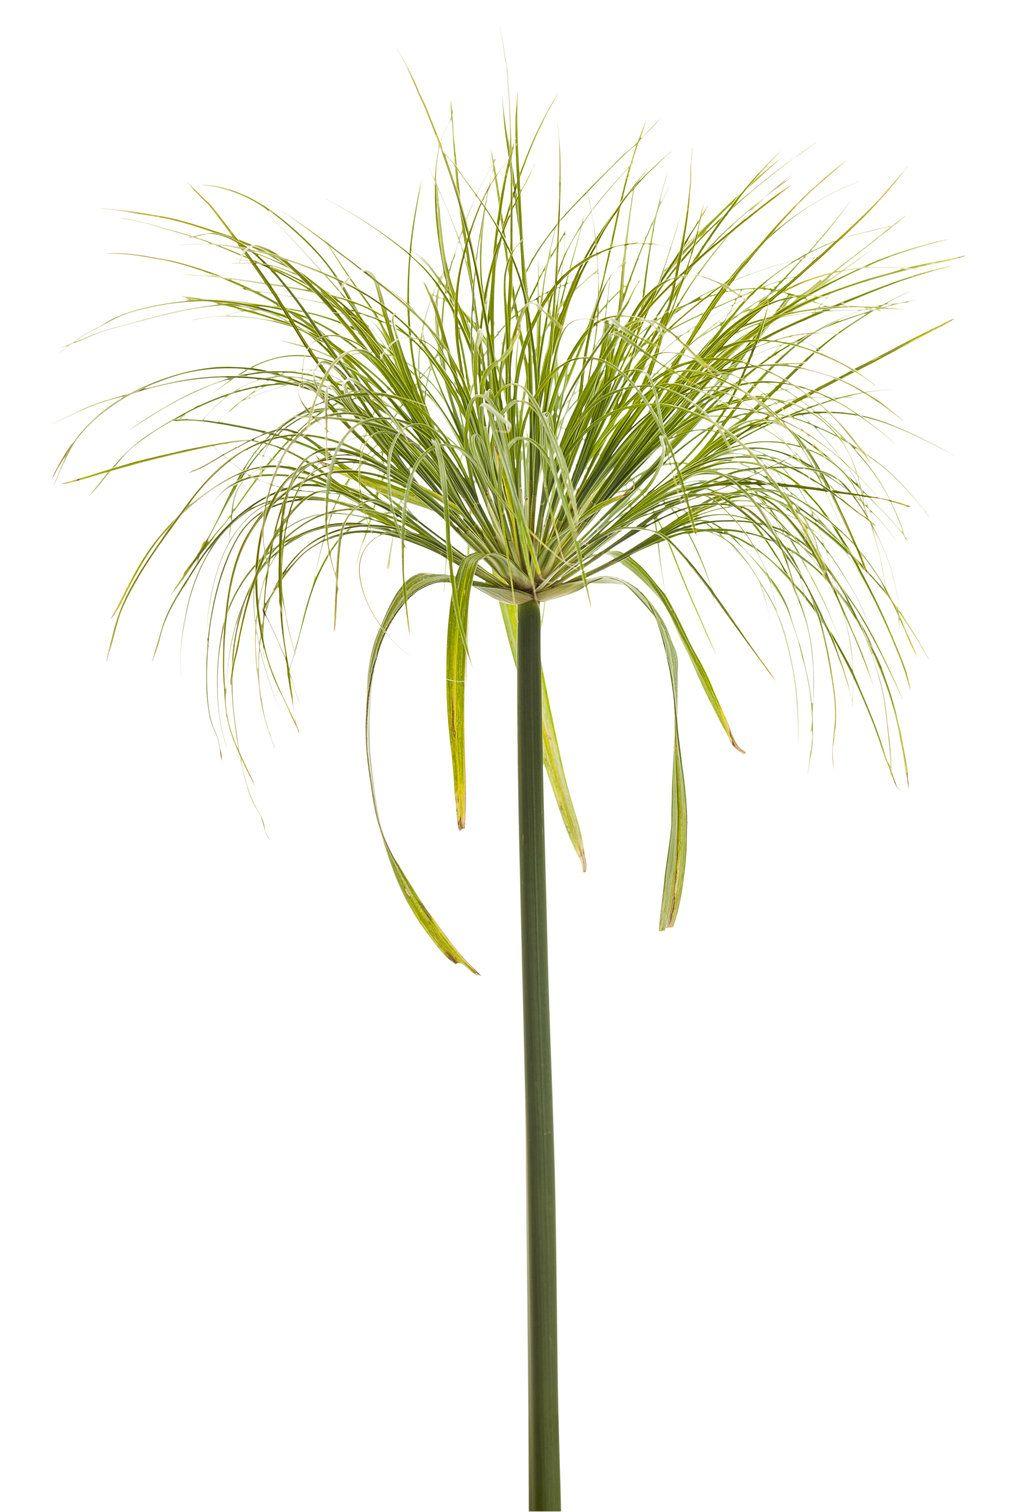 Graceful Grasses King Tut Egyptian Papyrus Cyperus